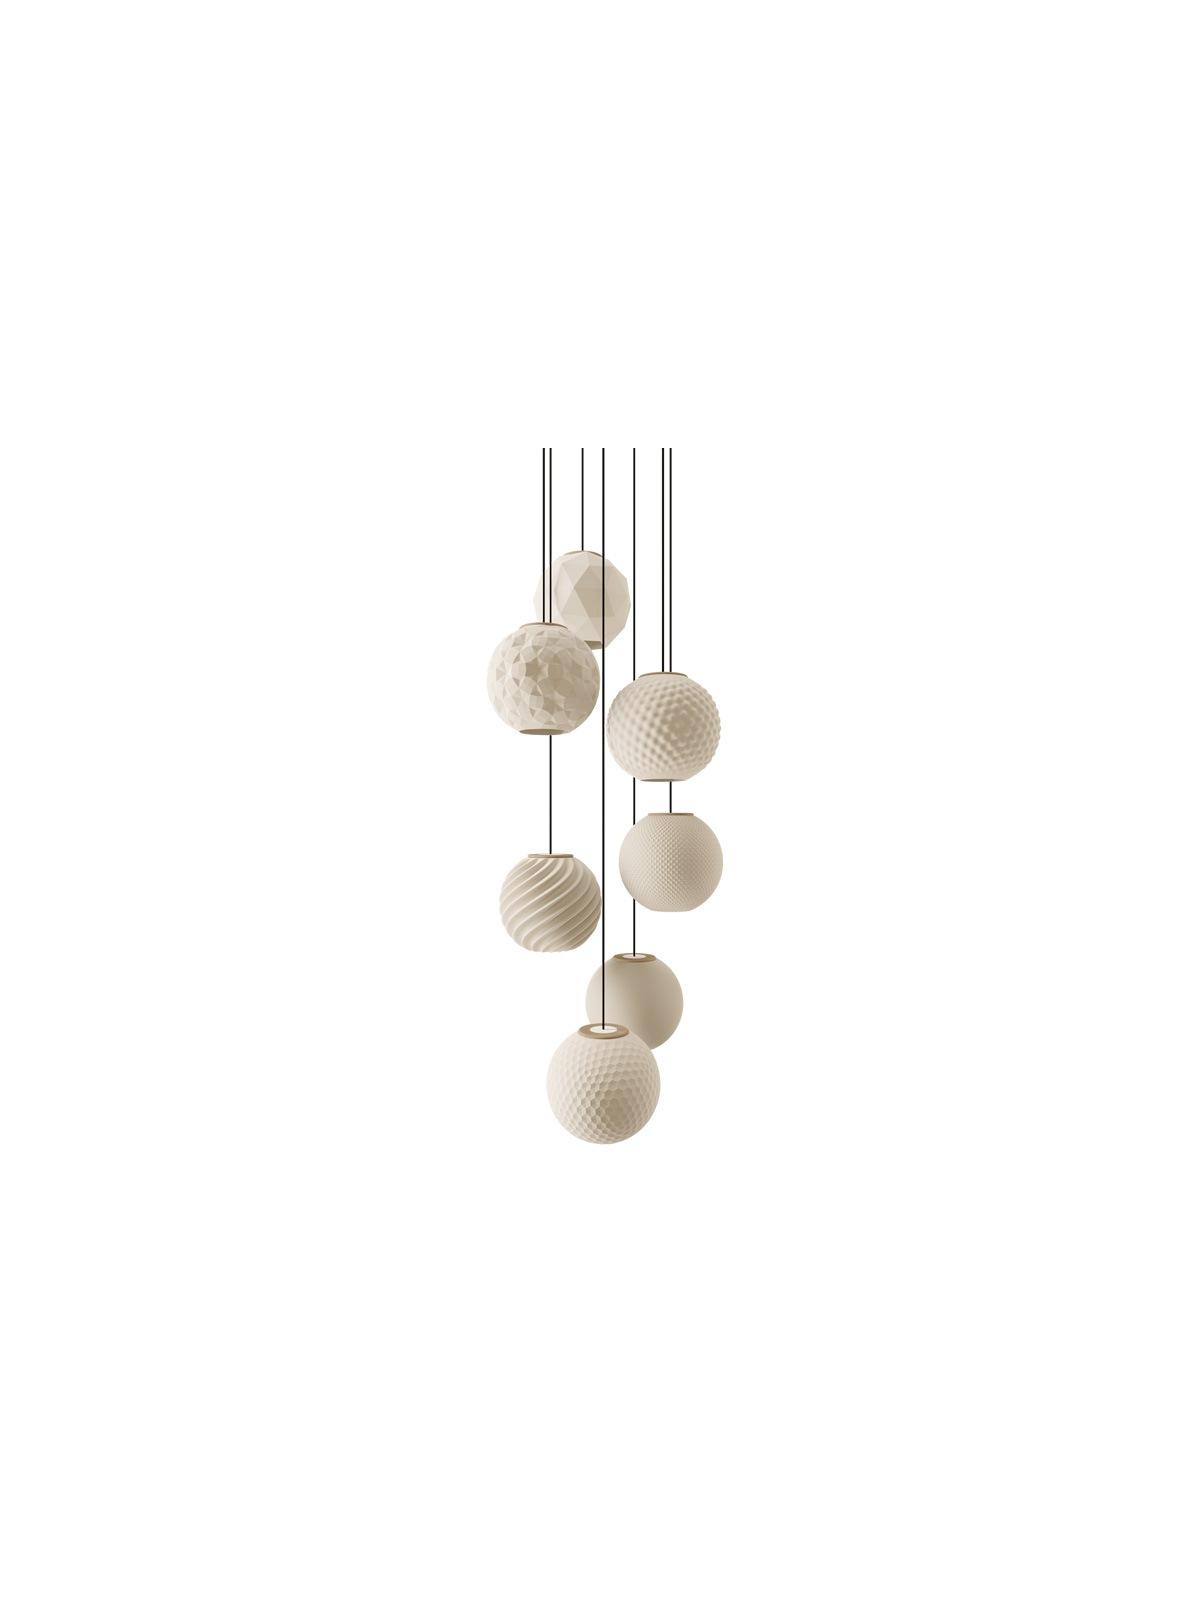 Random 7 Polyluma Designerleuchte DesignOrt Lampen Onlineshop Berlin